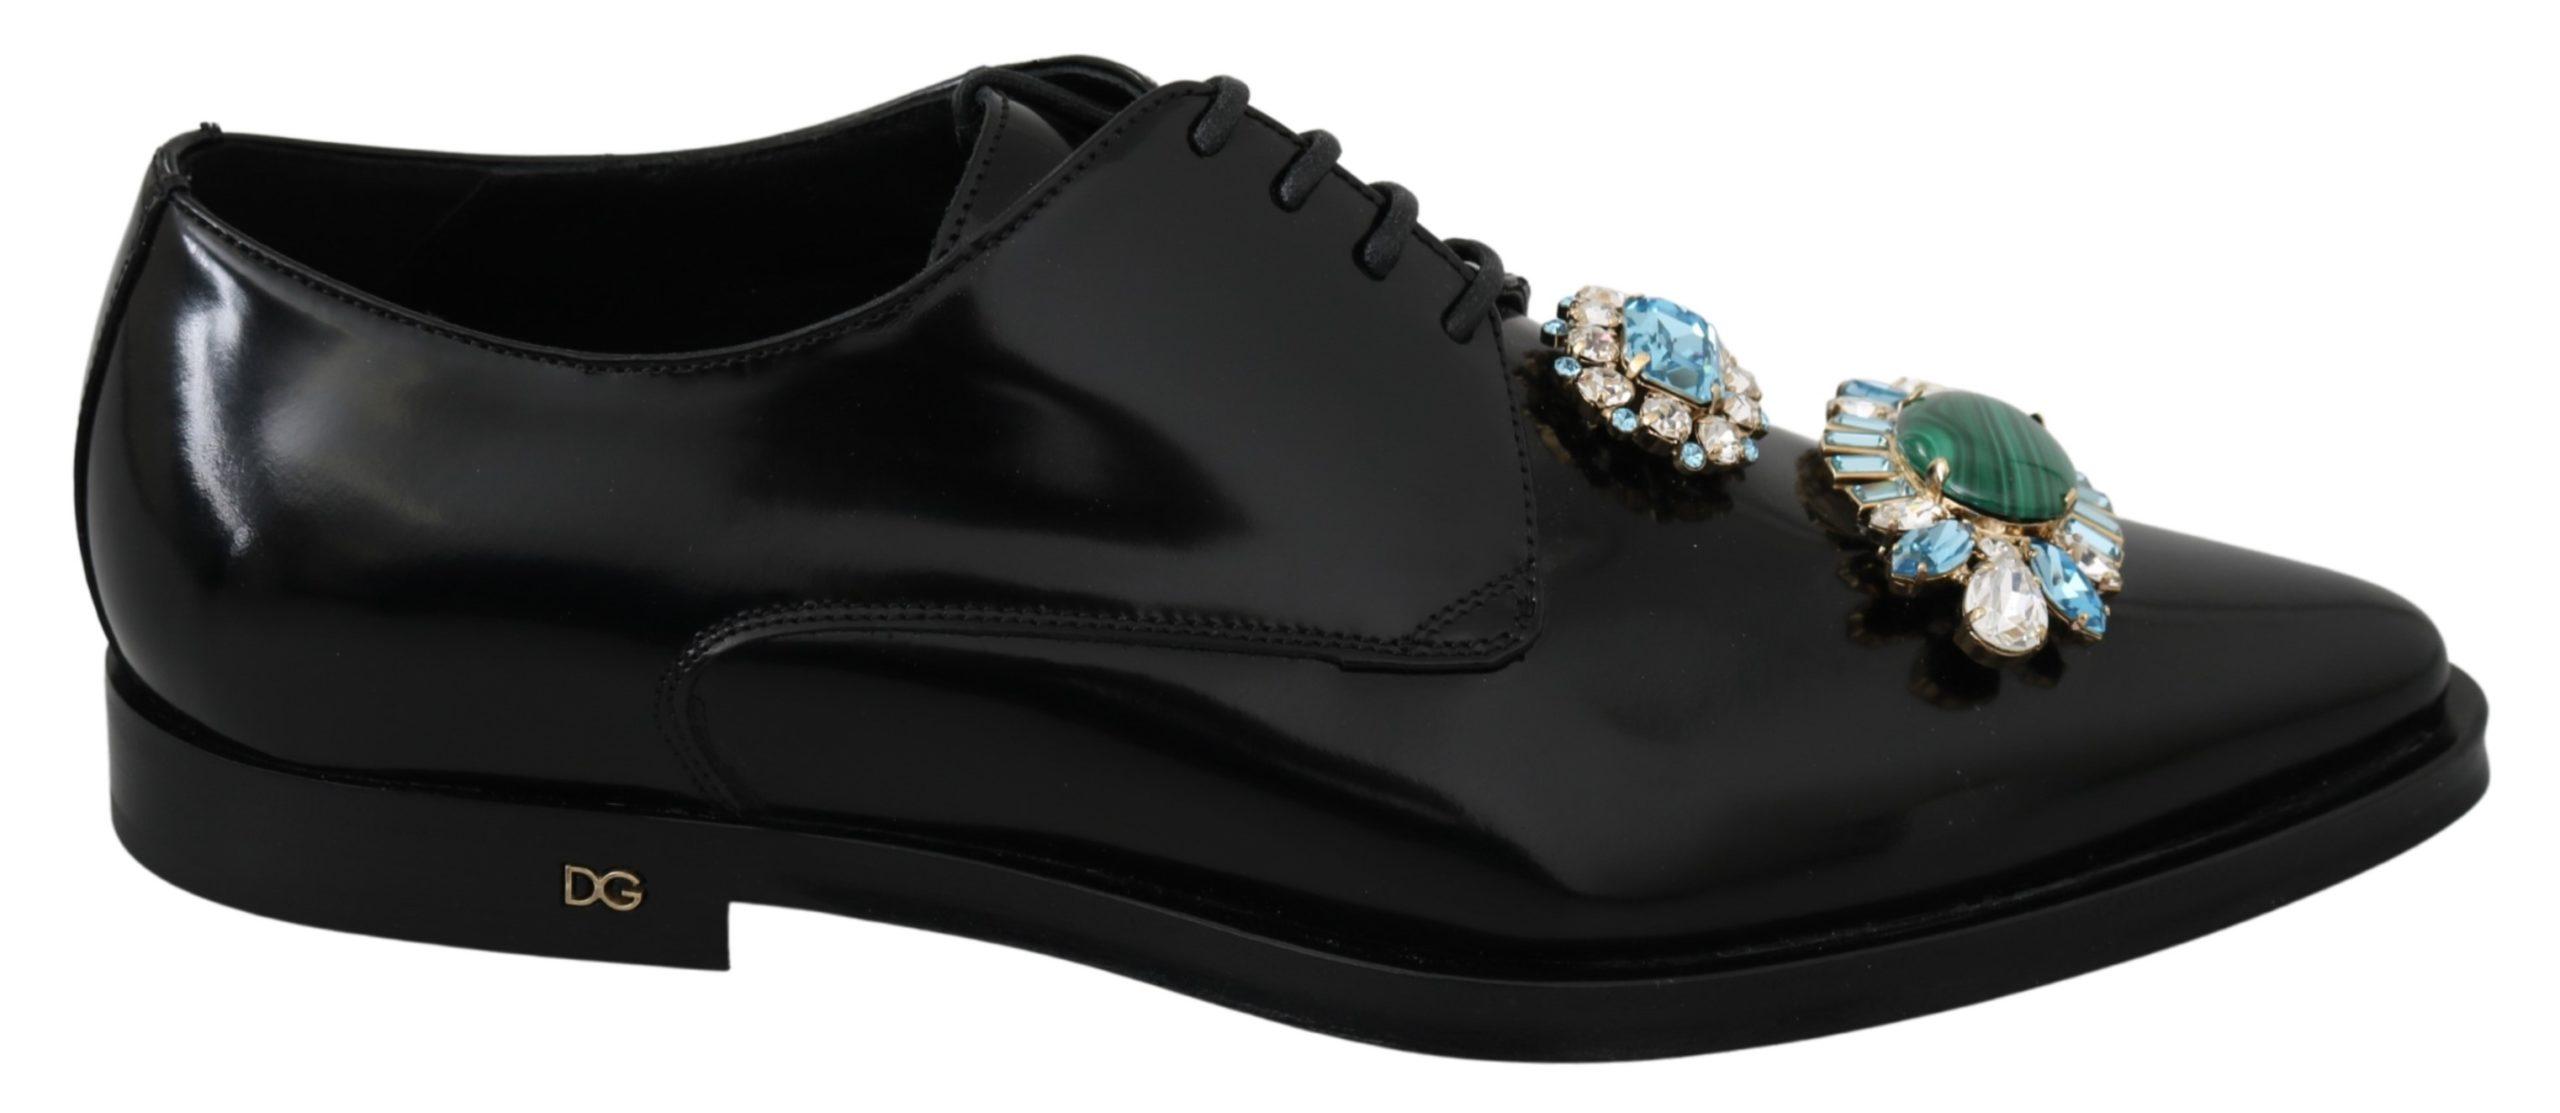 Dolce & Gabbana Women's Leather Crystal Dress Formal Shoes Black LA6804 - EU39/US8.5